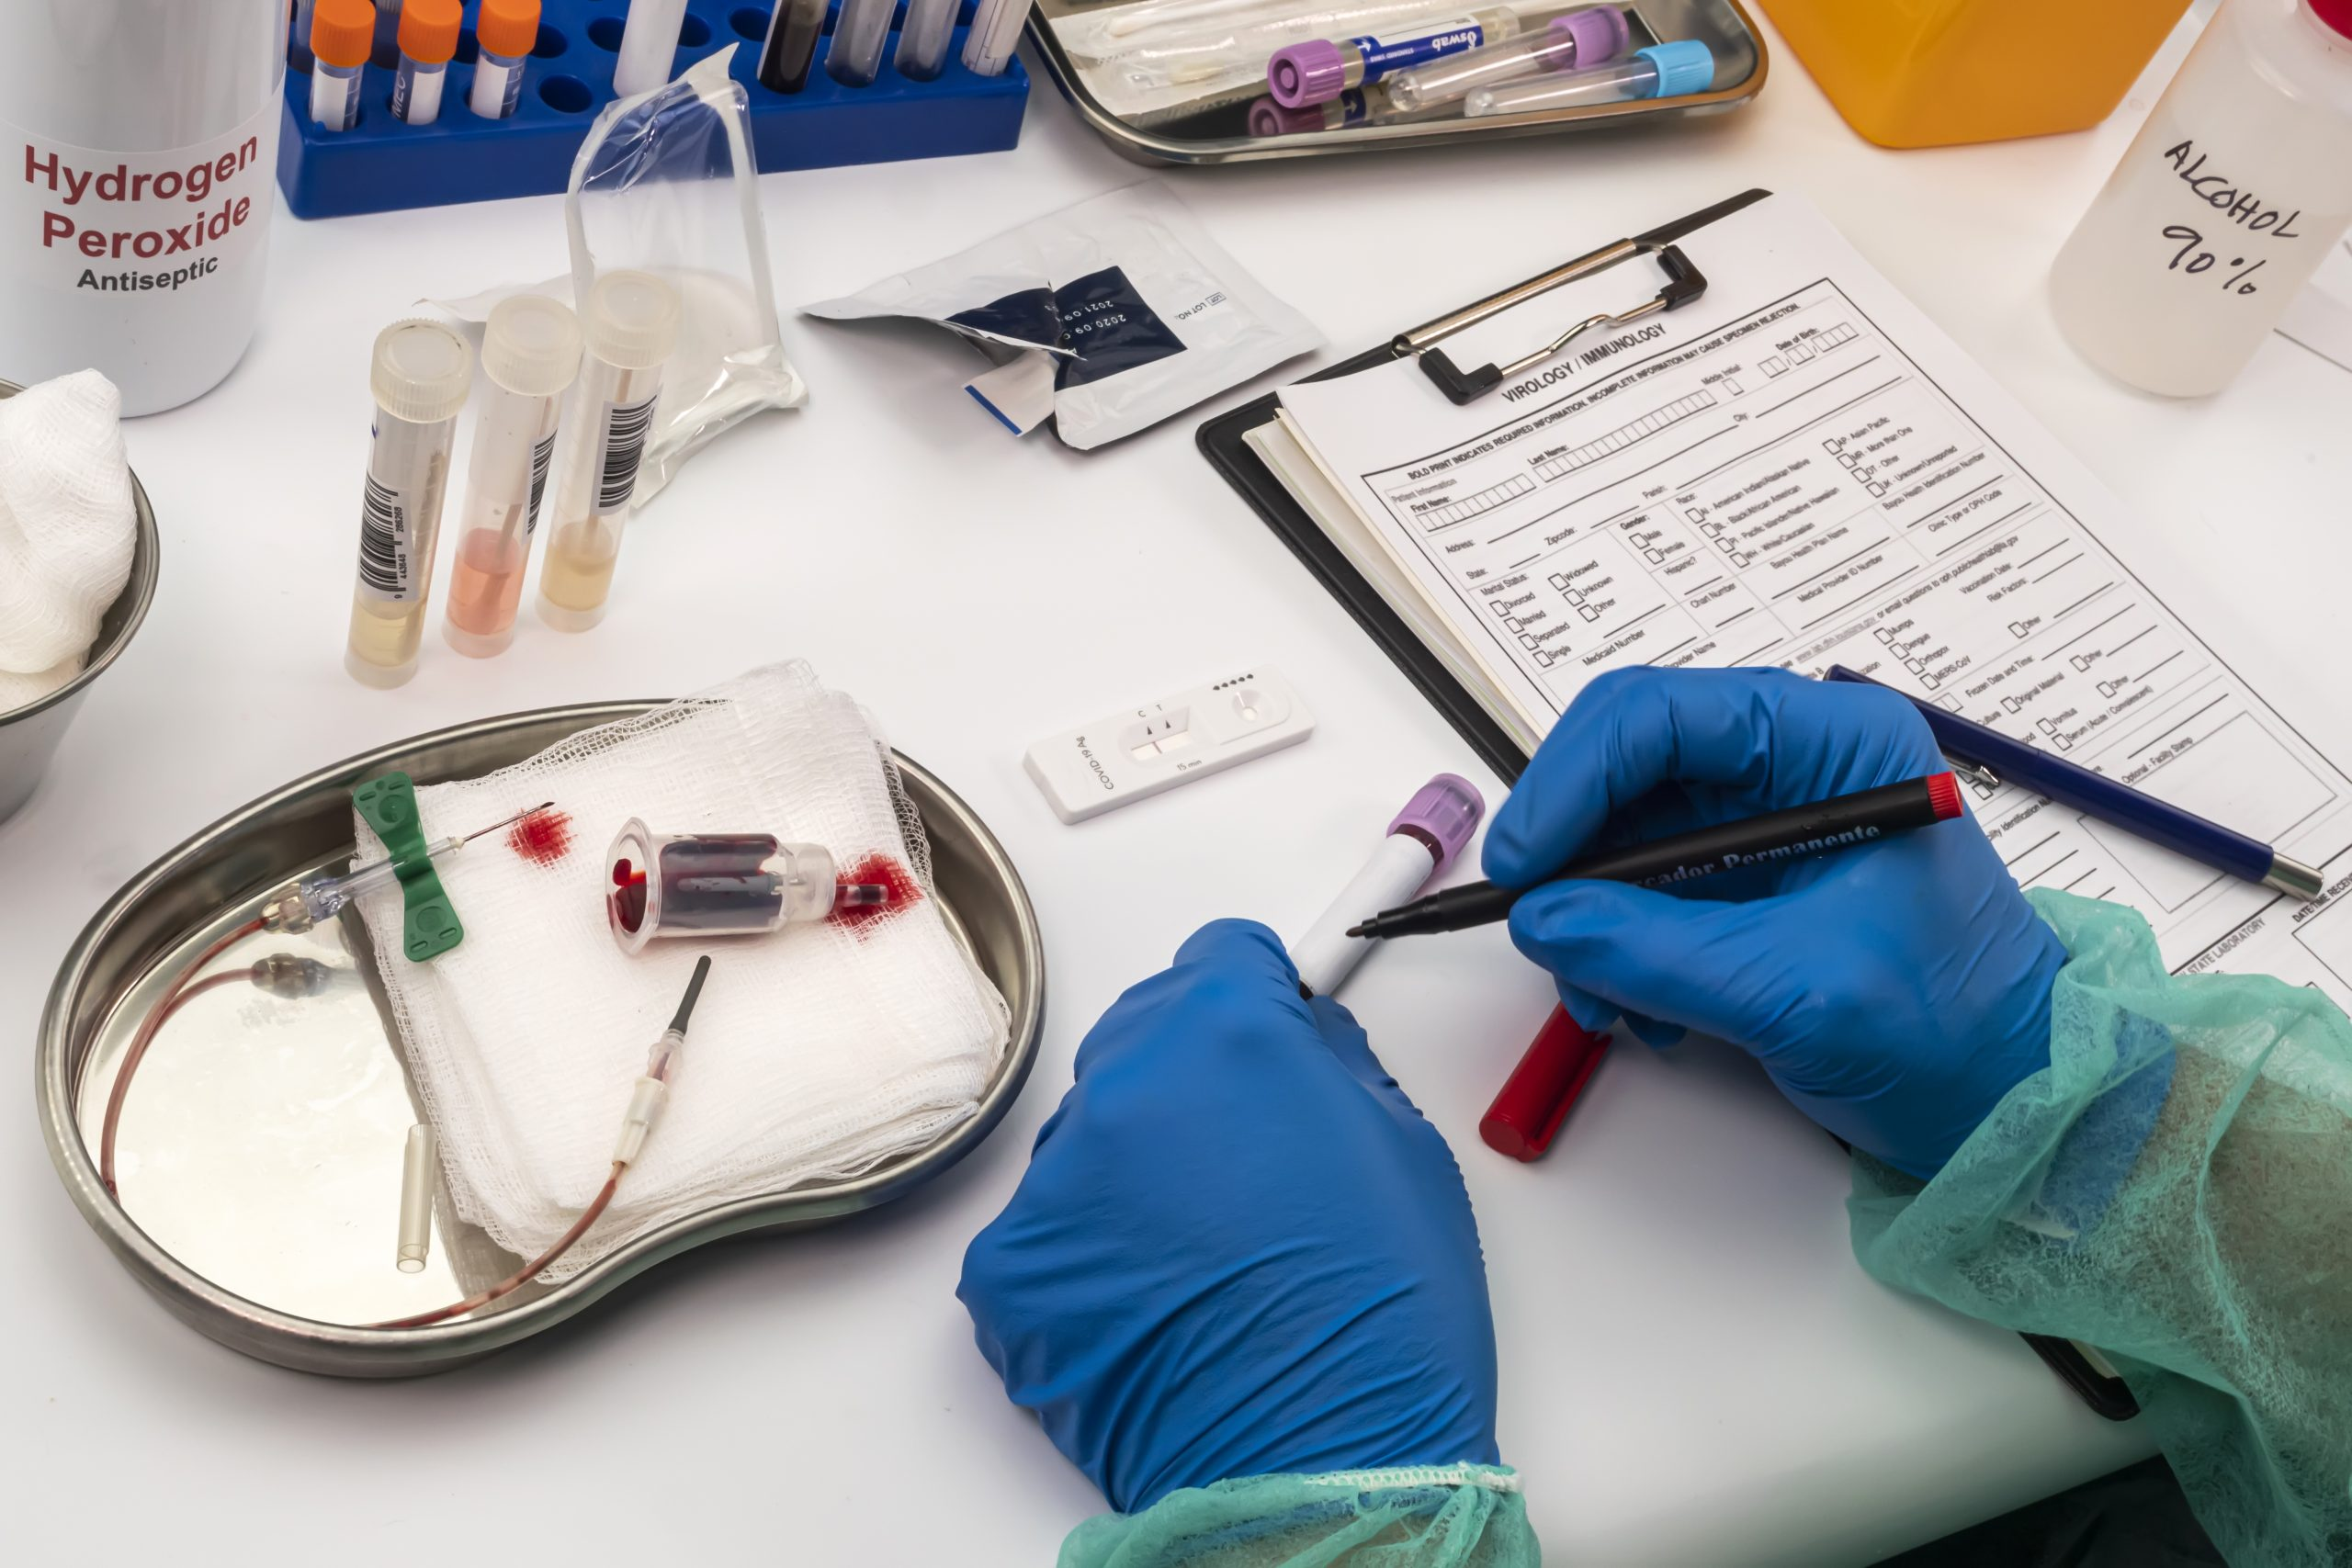 Empregador é condenado por realizar exames toxicológicos em empregados